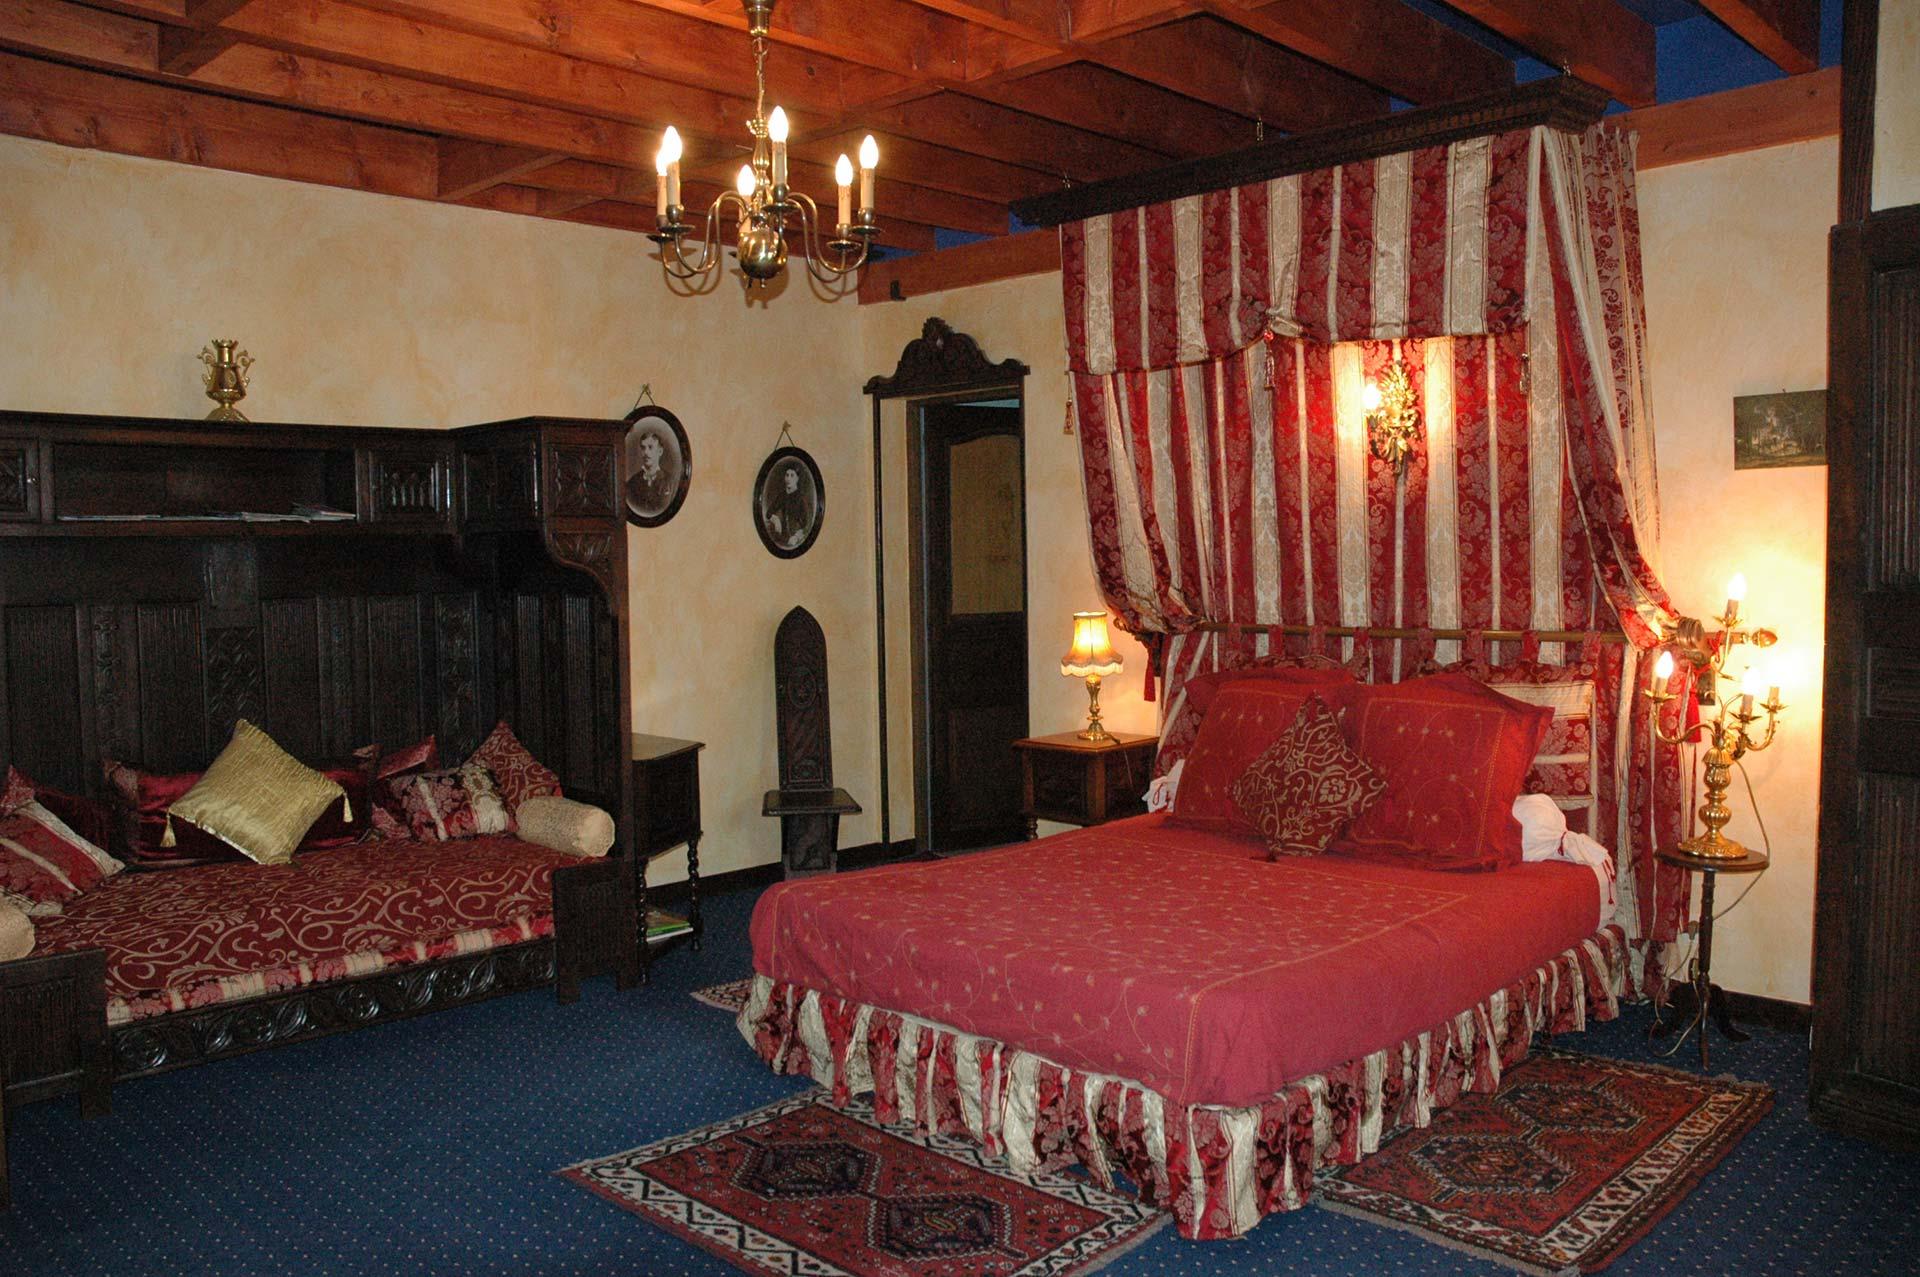 manoir room chambres d 39 h tes les m tamorphozes. Black Bedroom Furniture Sets. Home Design Ideas